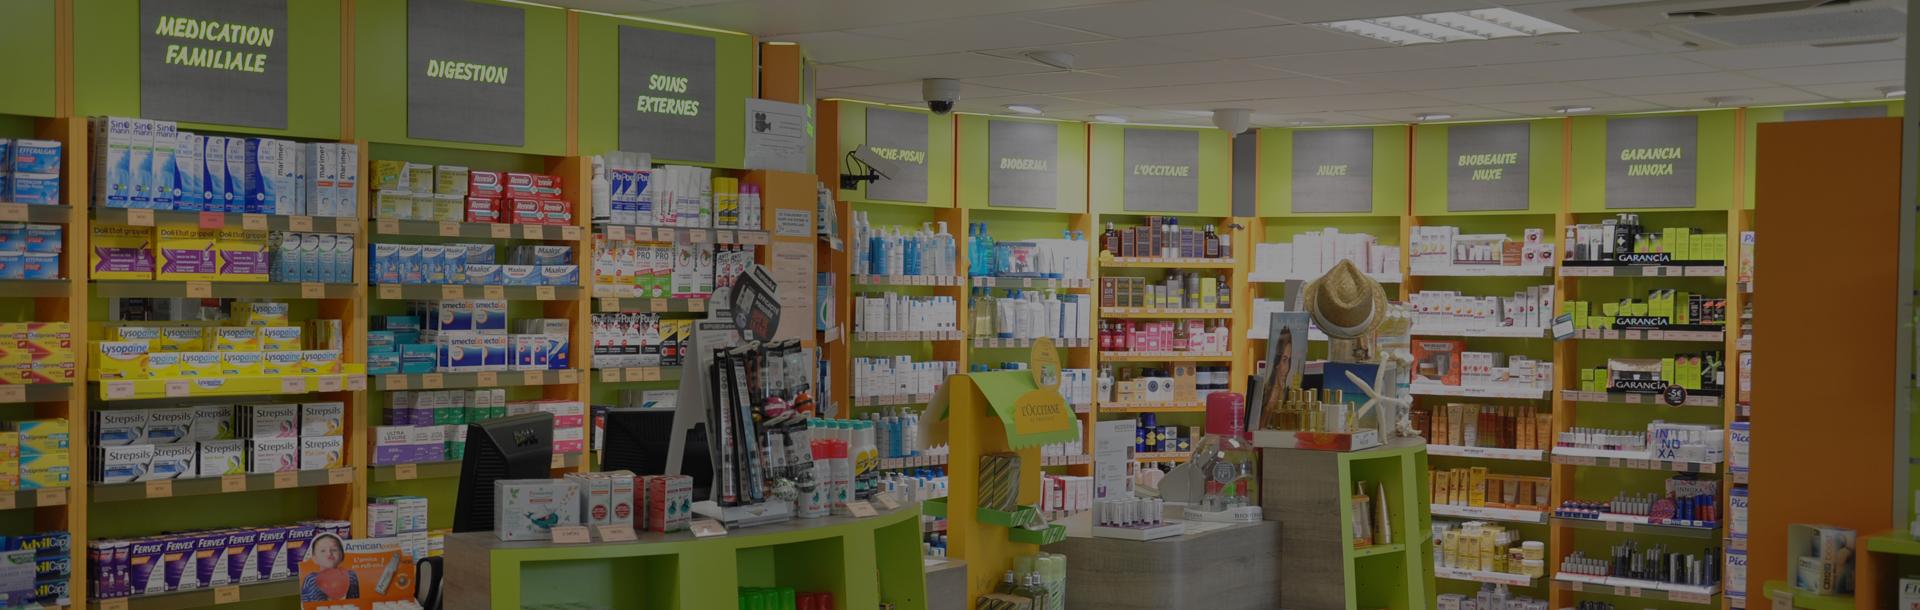 Pharmacie-de-la-Vienne-86-Mirebeau-Loudun-Neuville